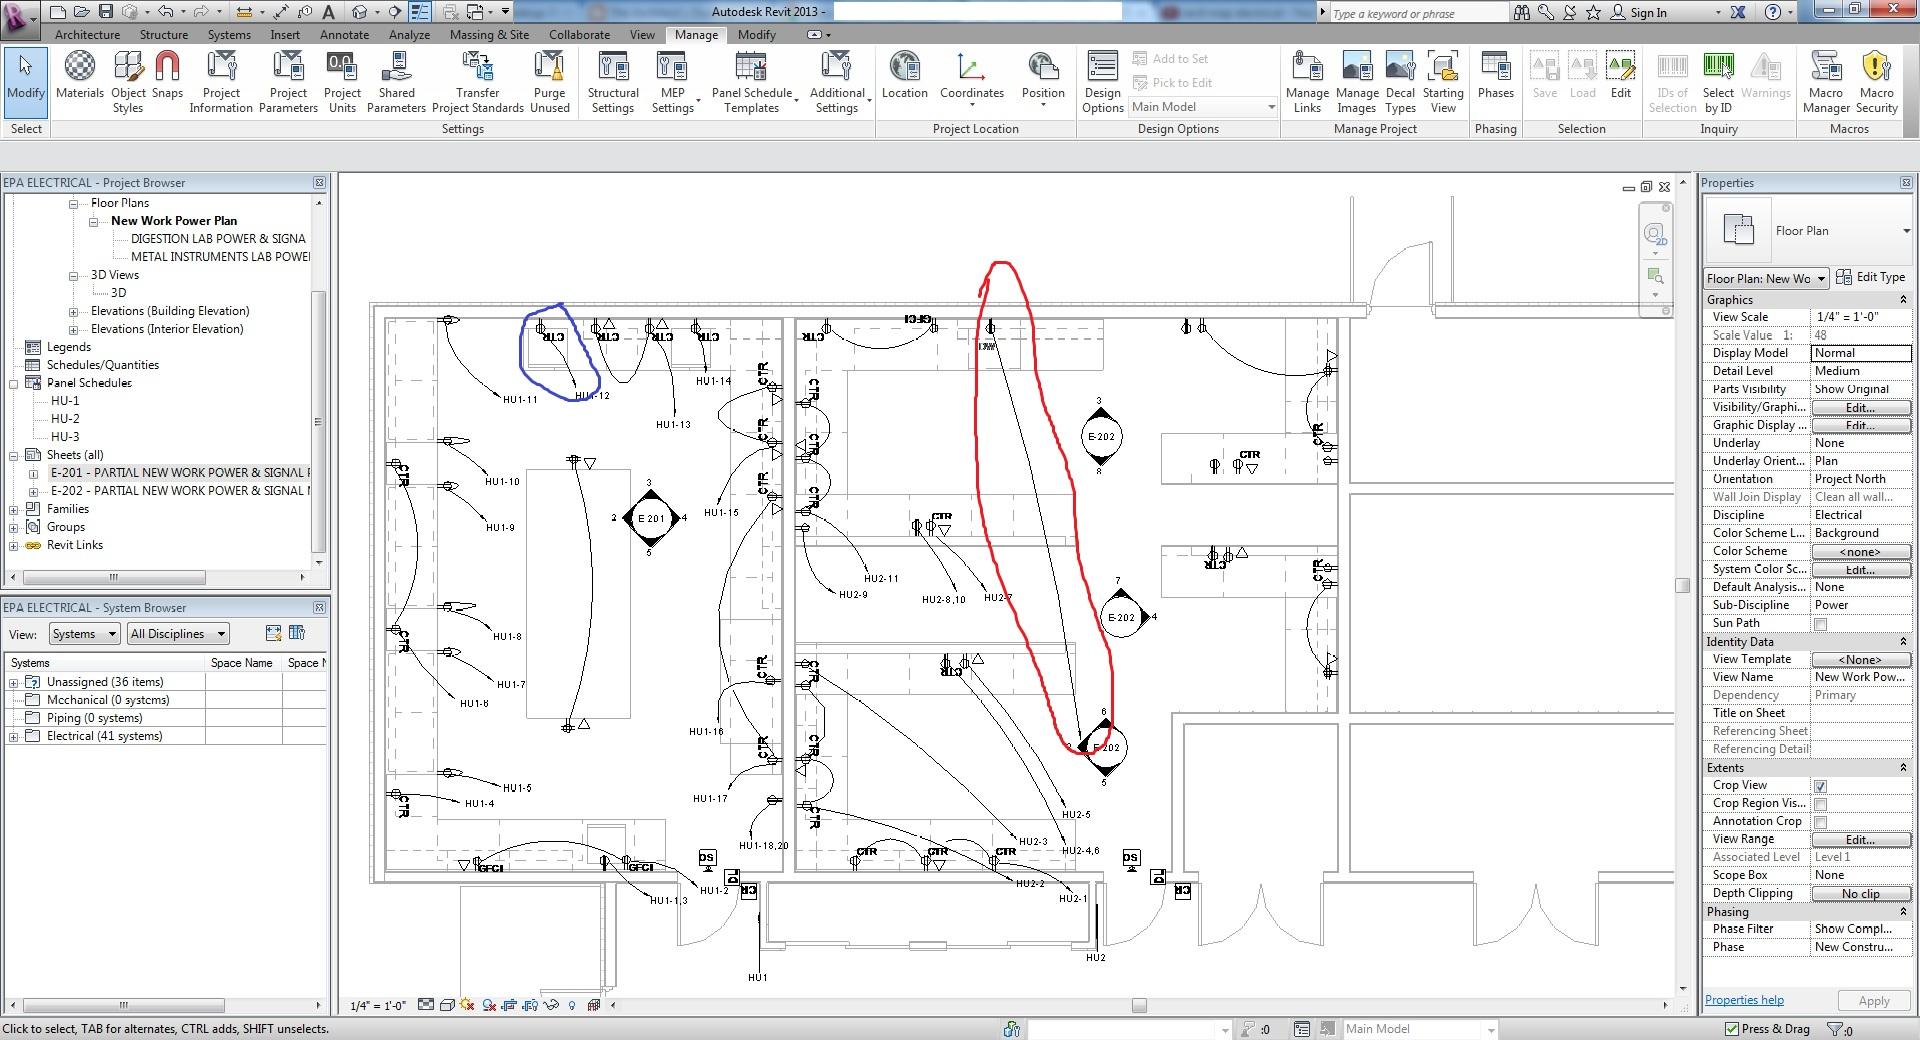 109647_home_run?resize\\\\\\\\\\\\\\\\\\\\\\\\\\\\\\\\\\\\\\\\\\\\\\\\\\\\\\\\\\\\\\\=665%2C360 gnx fleetmatics wiring diagram wiring diagram images fleetmatics wiring diagram at reclaimingppi.co